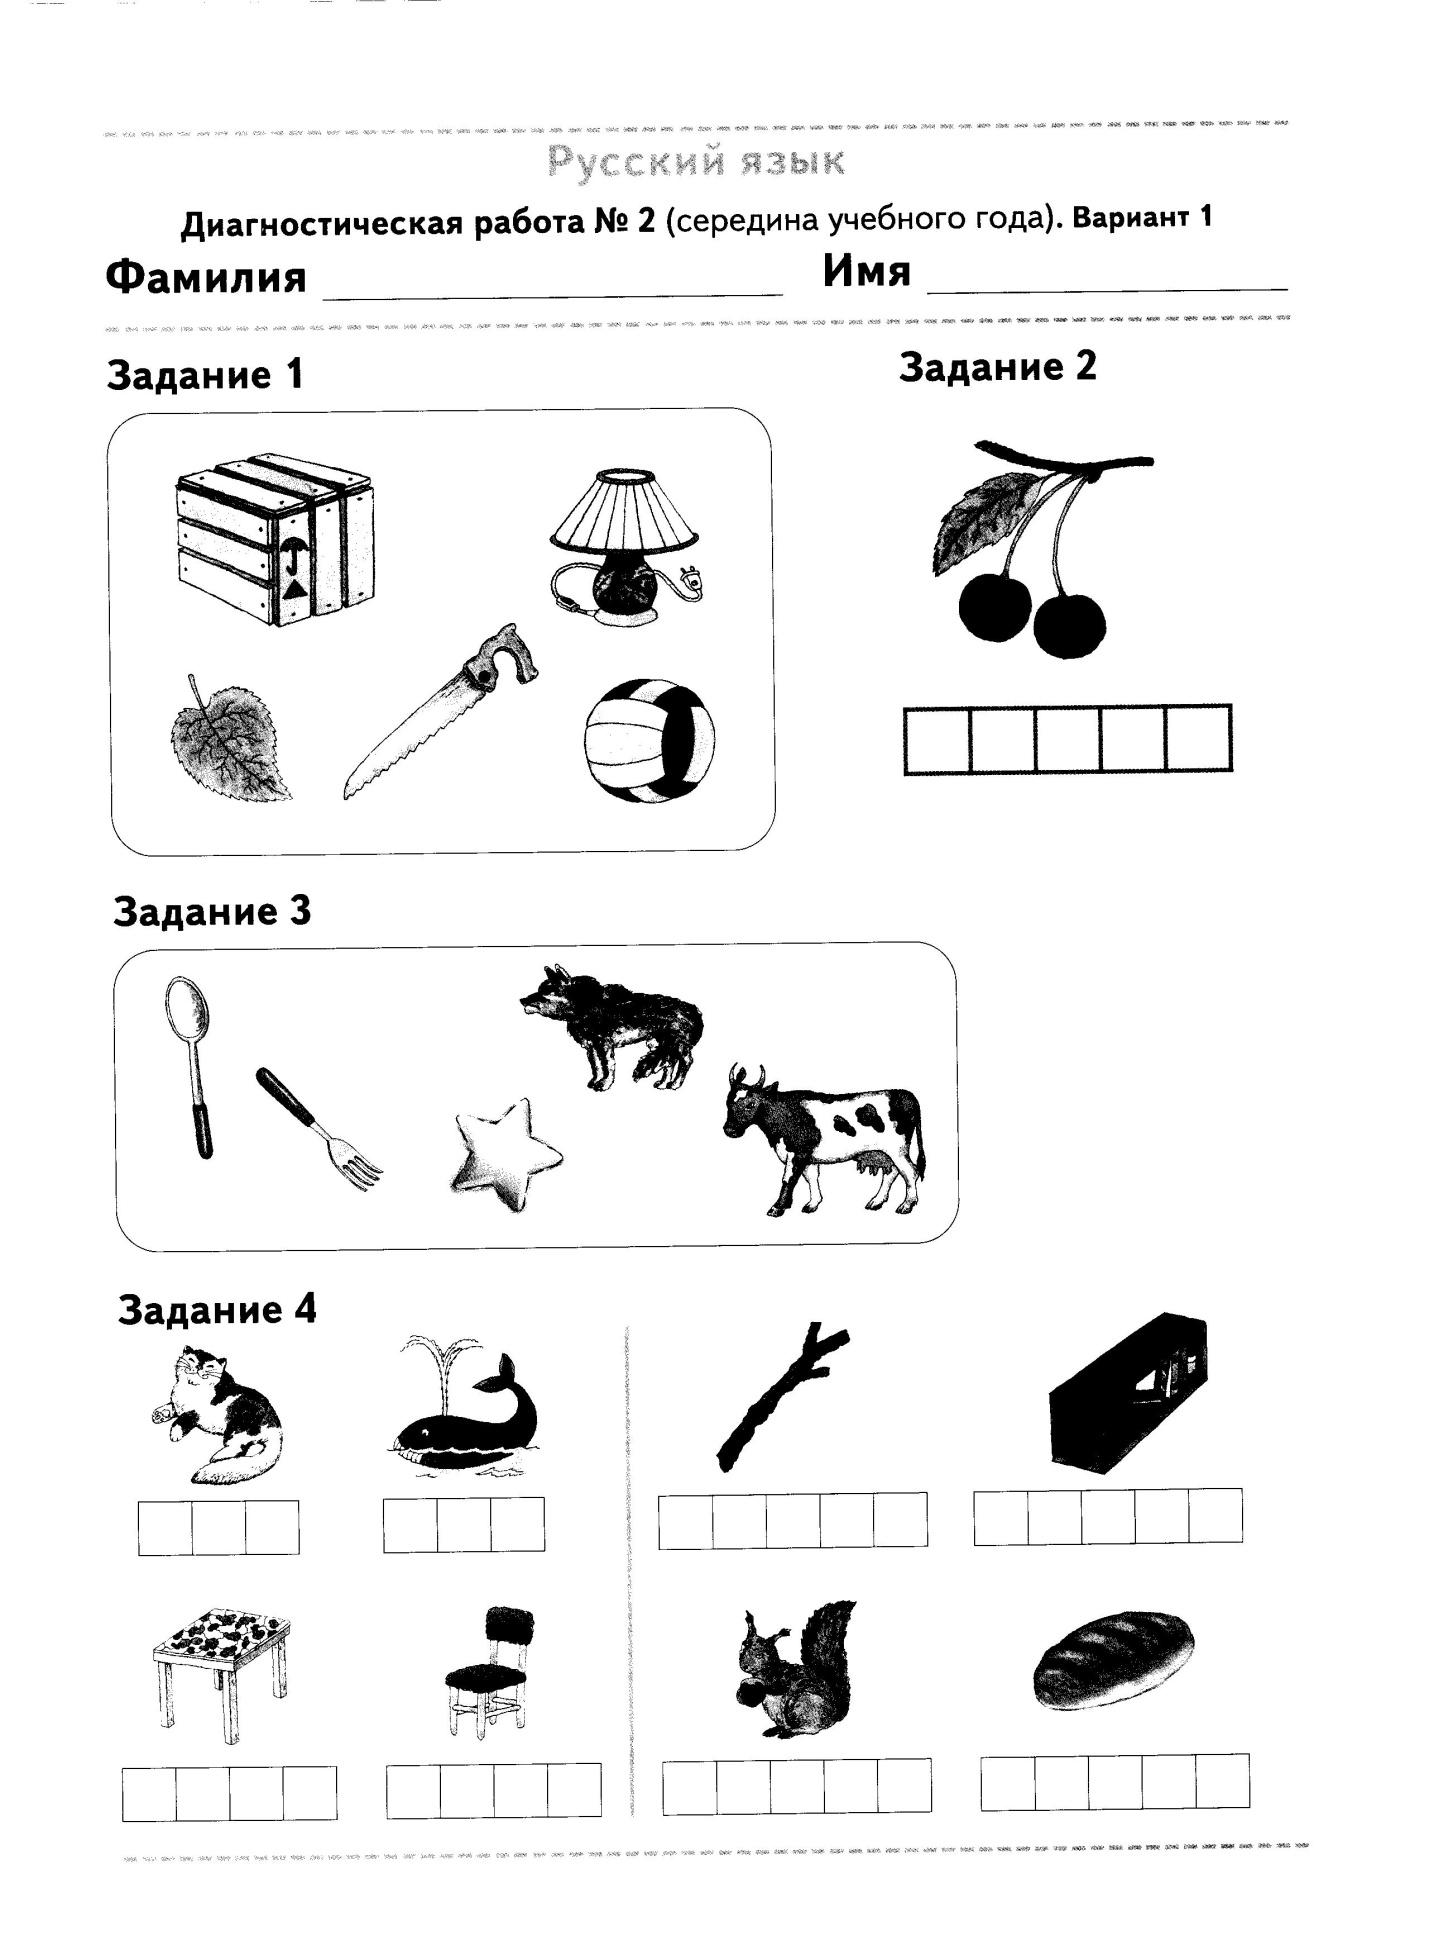 C:\Documents and Settings\User\Мои документы\Мои рисунки\2014-12-15\Диагностическая работа по математике, 2 класс, Виноградова Н..jpg